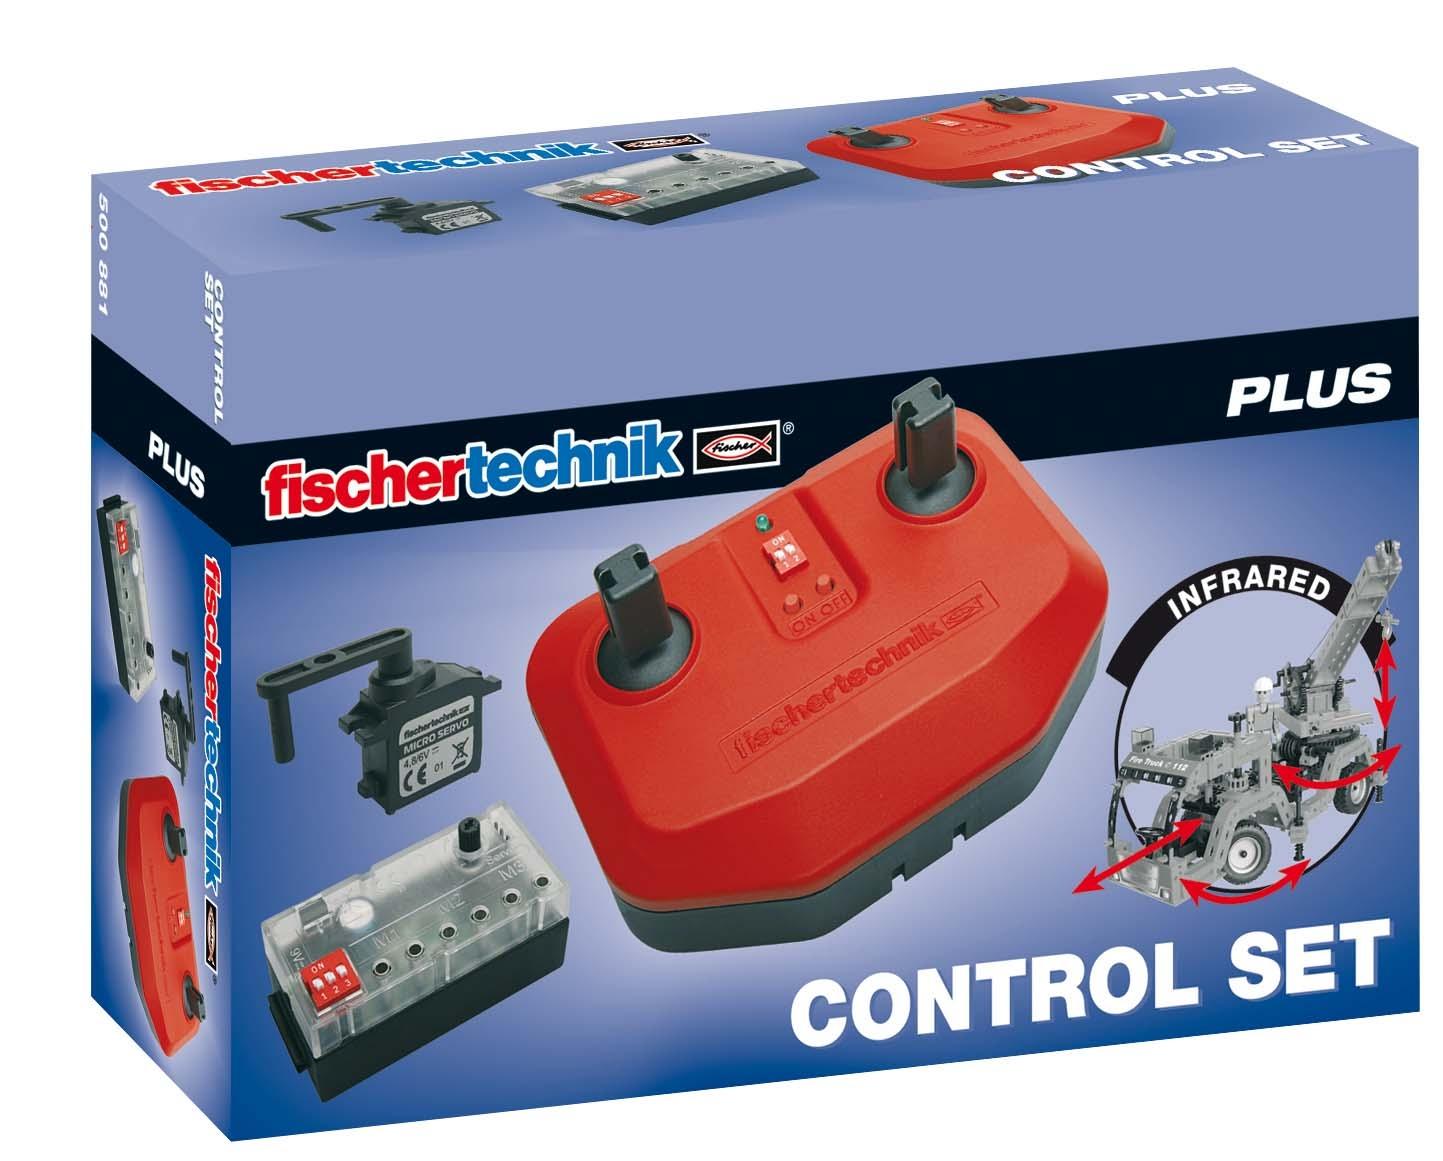 Control Set